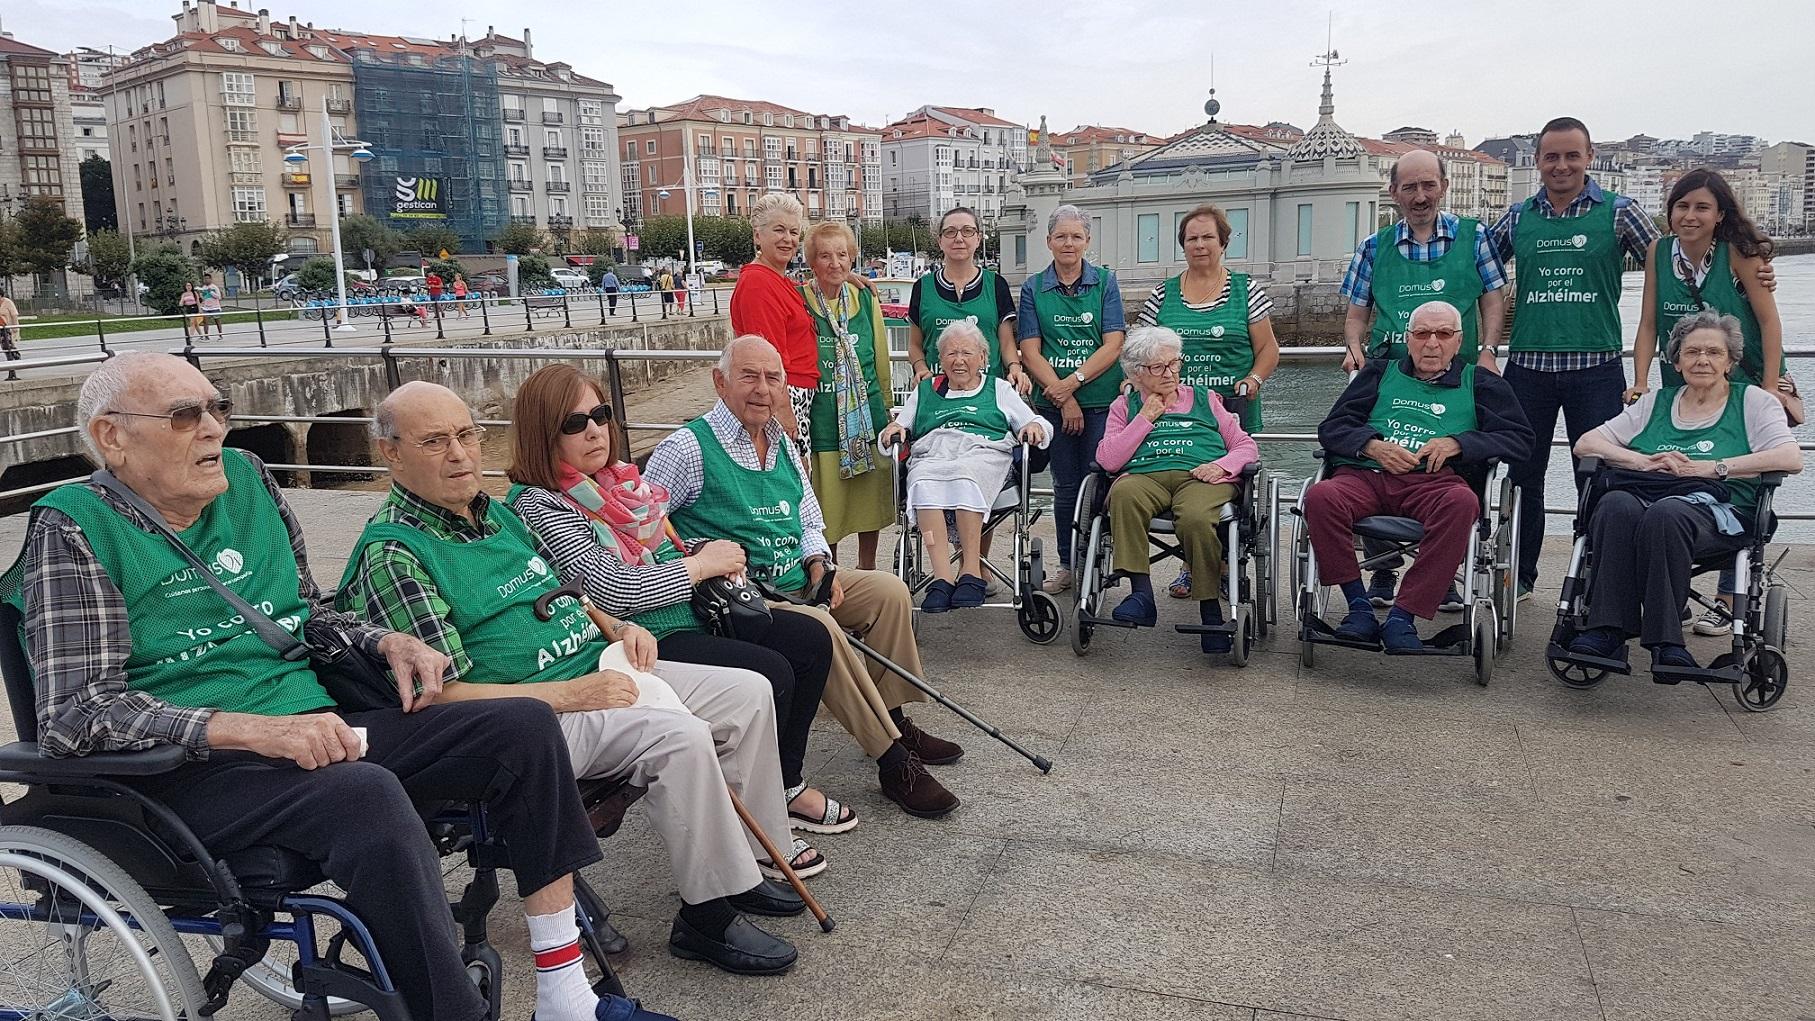 Alzheimer Santander Residencia Stella Maris Km para recordar kilometros para recordar